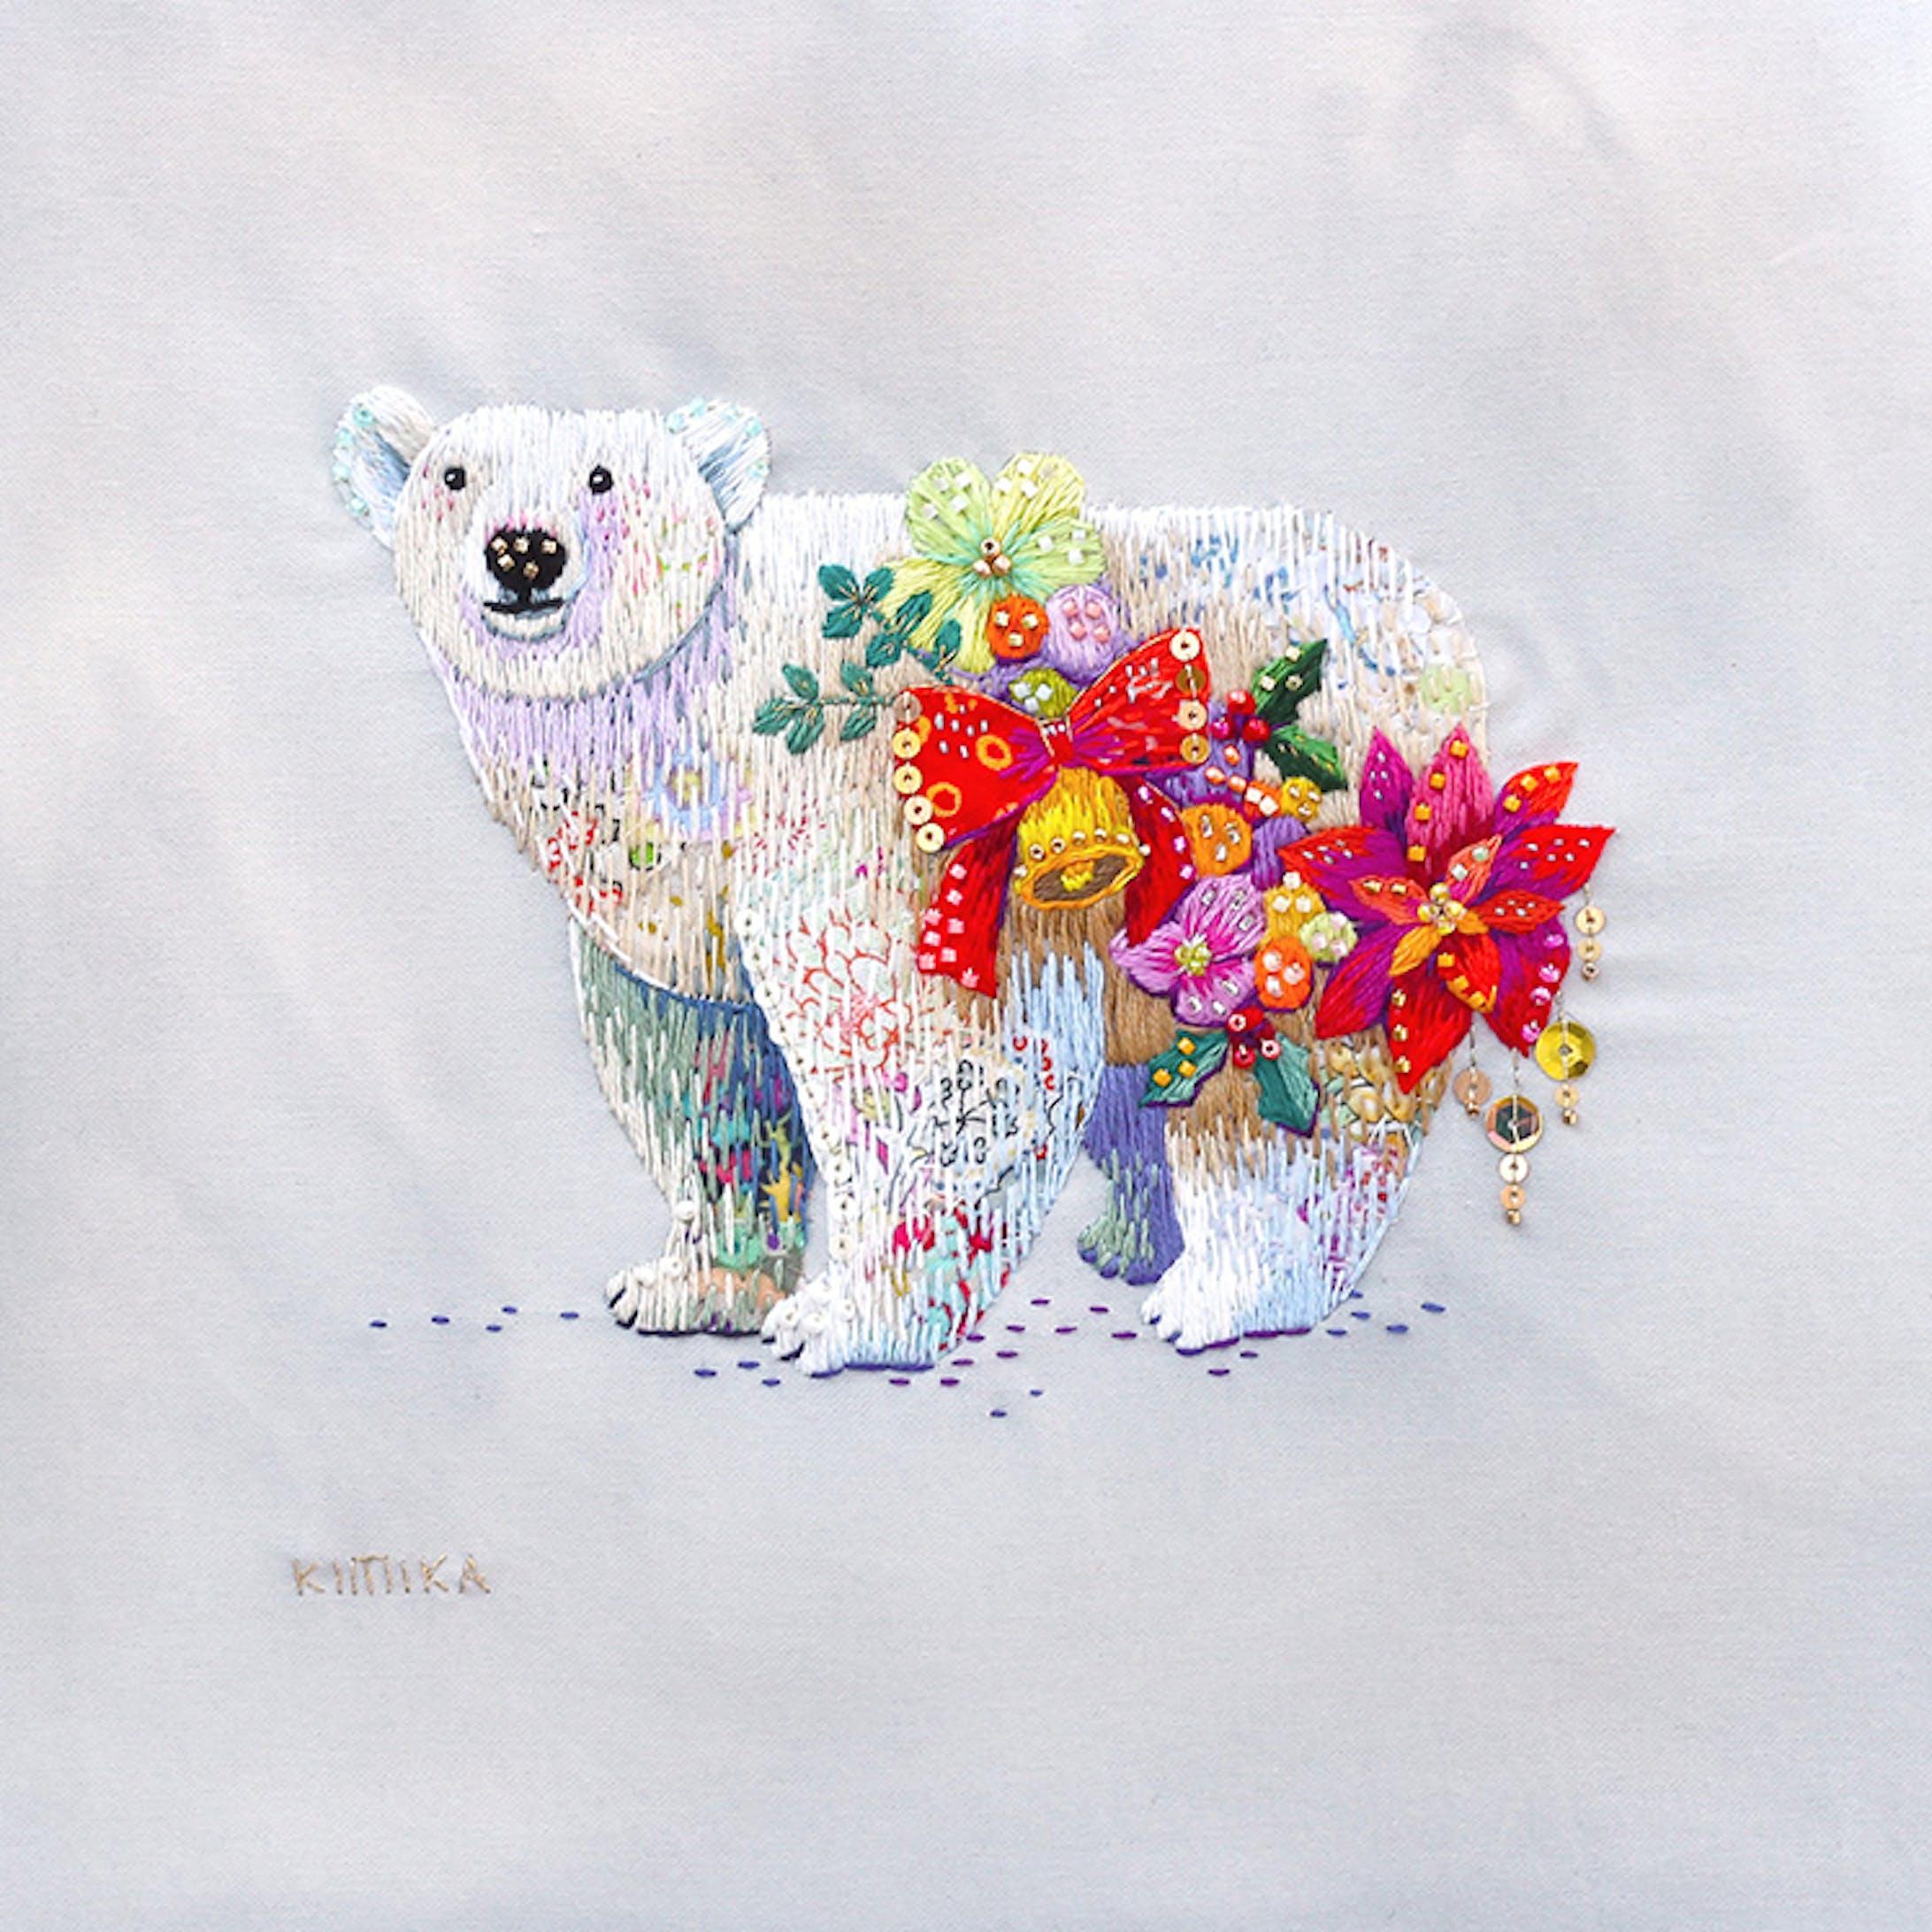 animals-12